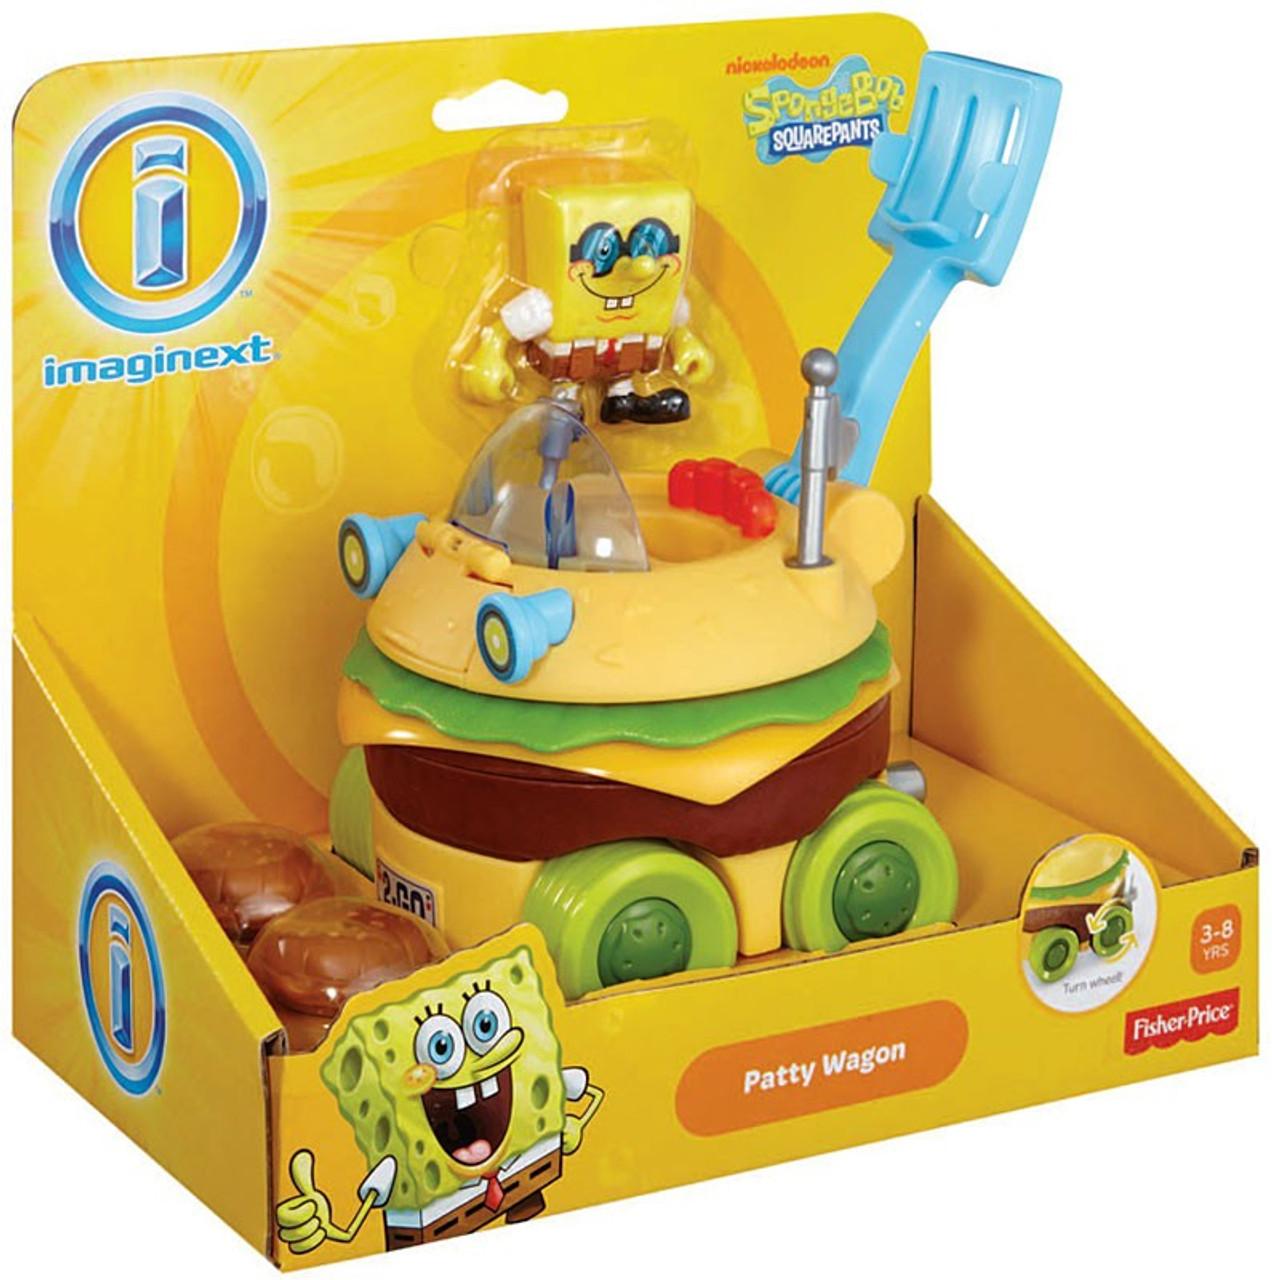 Fisher Price Spongebob Squarepants Imaginext Patty Wagon 2-Inch Vehicle Set